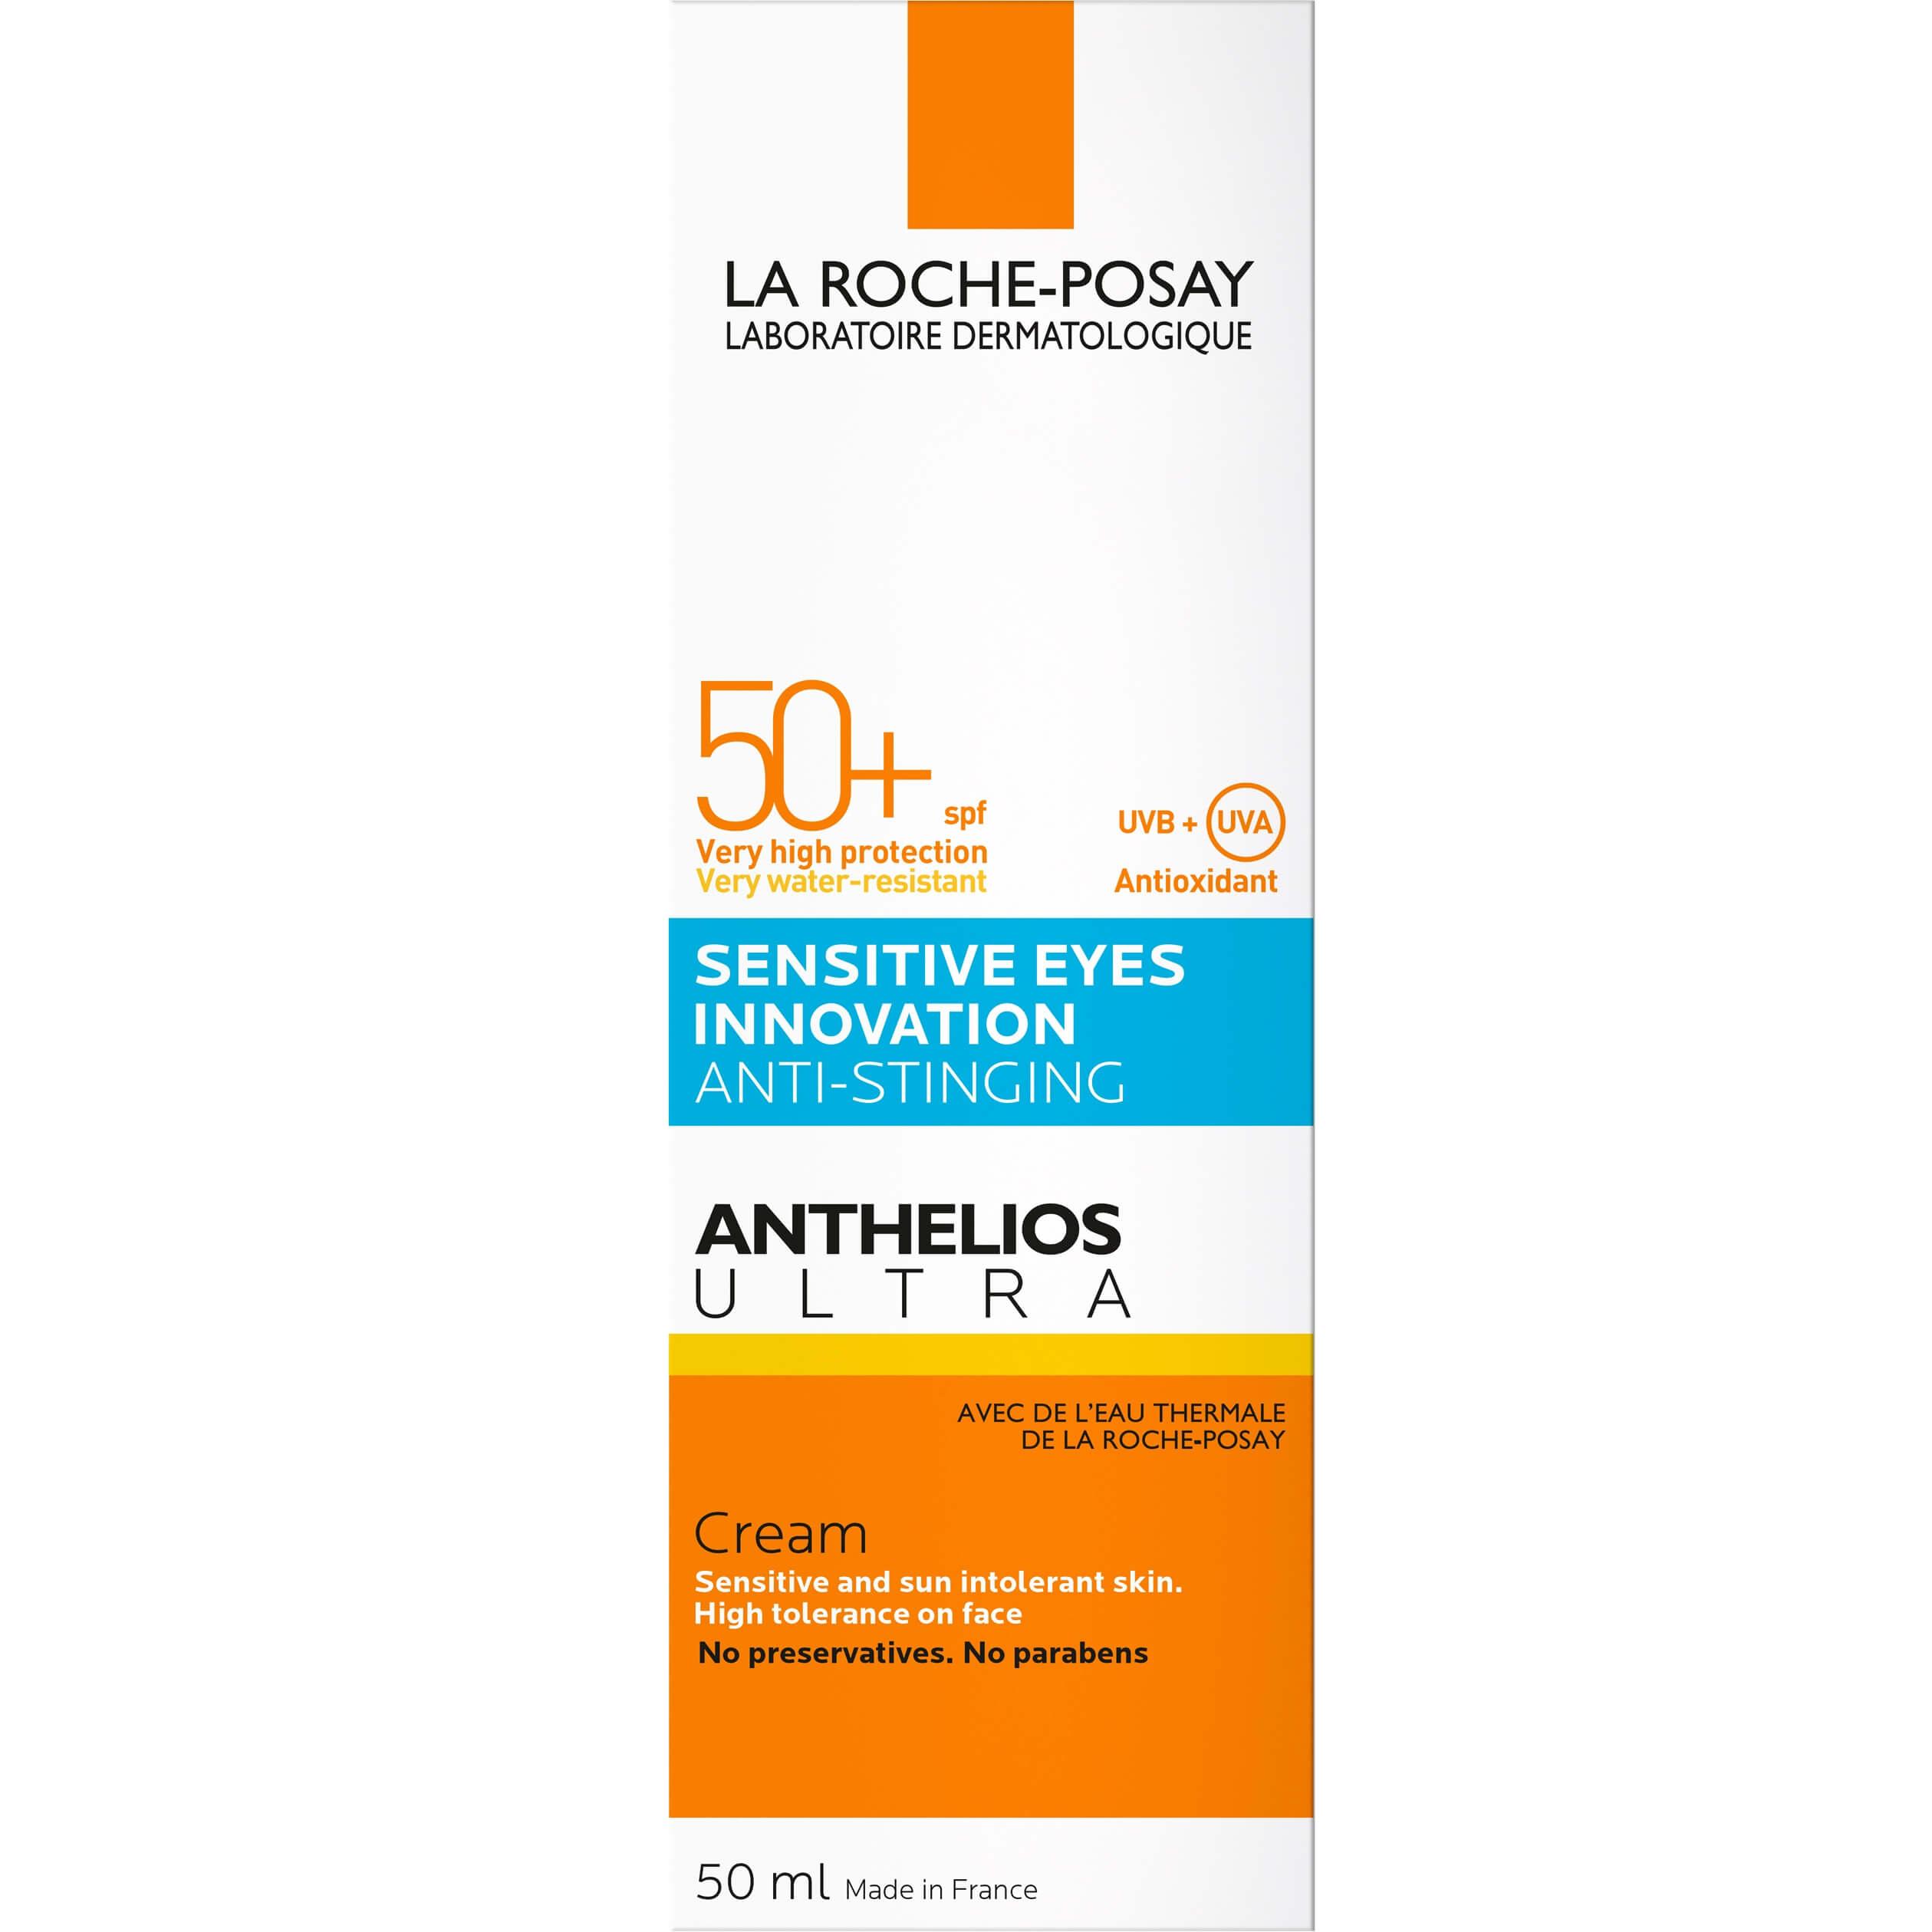 La Roche-Posay Anthelios Ultra Sensitive Eyes InnovationCream Spf50+ Αντηλιακό ΠροσώπουΕνάντιαστο Τσούξιμοτων Ματιών50ml